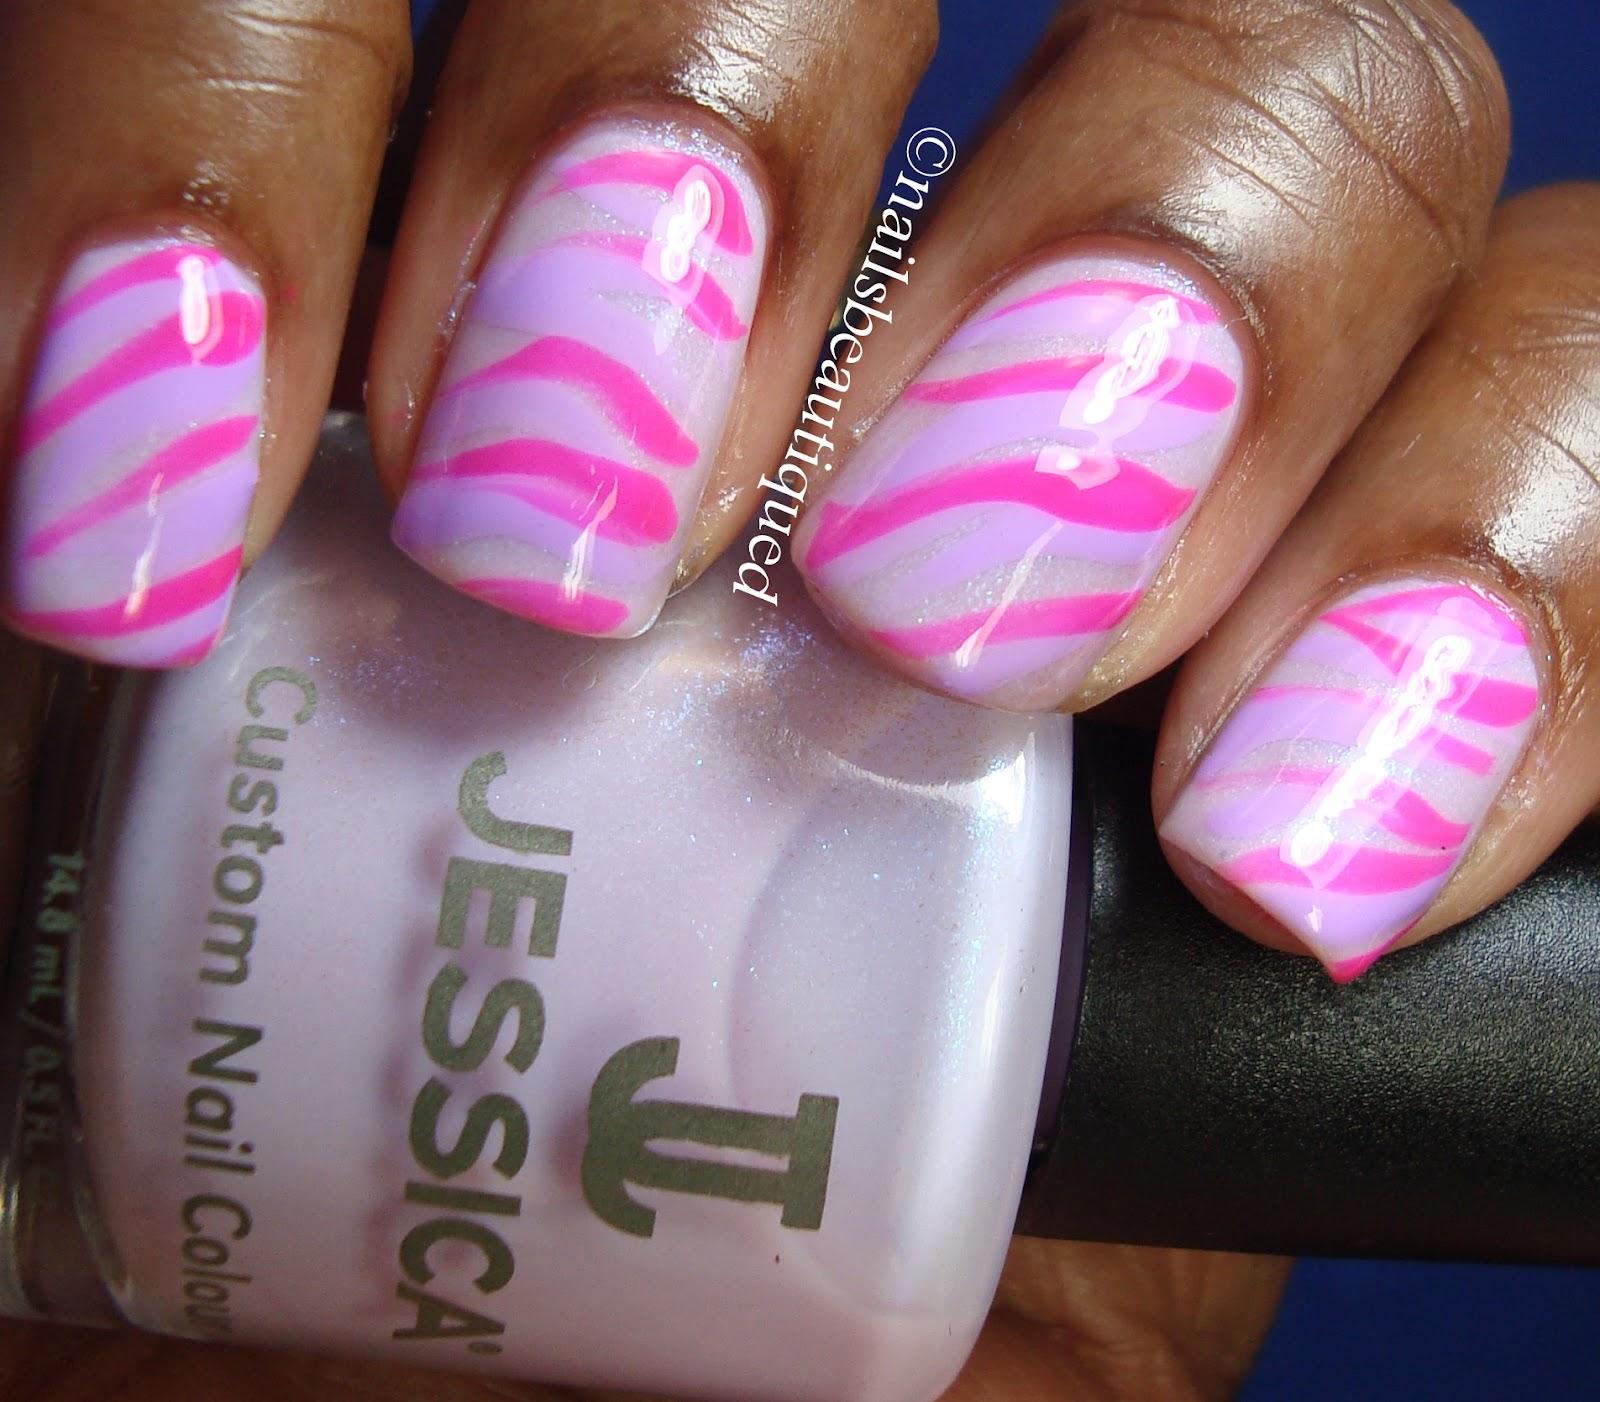 unbitten polish: Zebra Stripe Nail Art Design